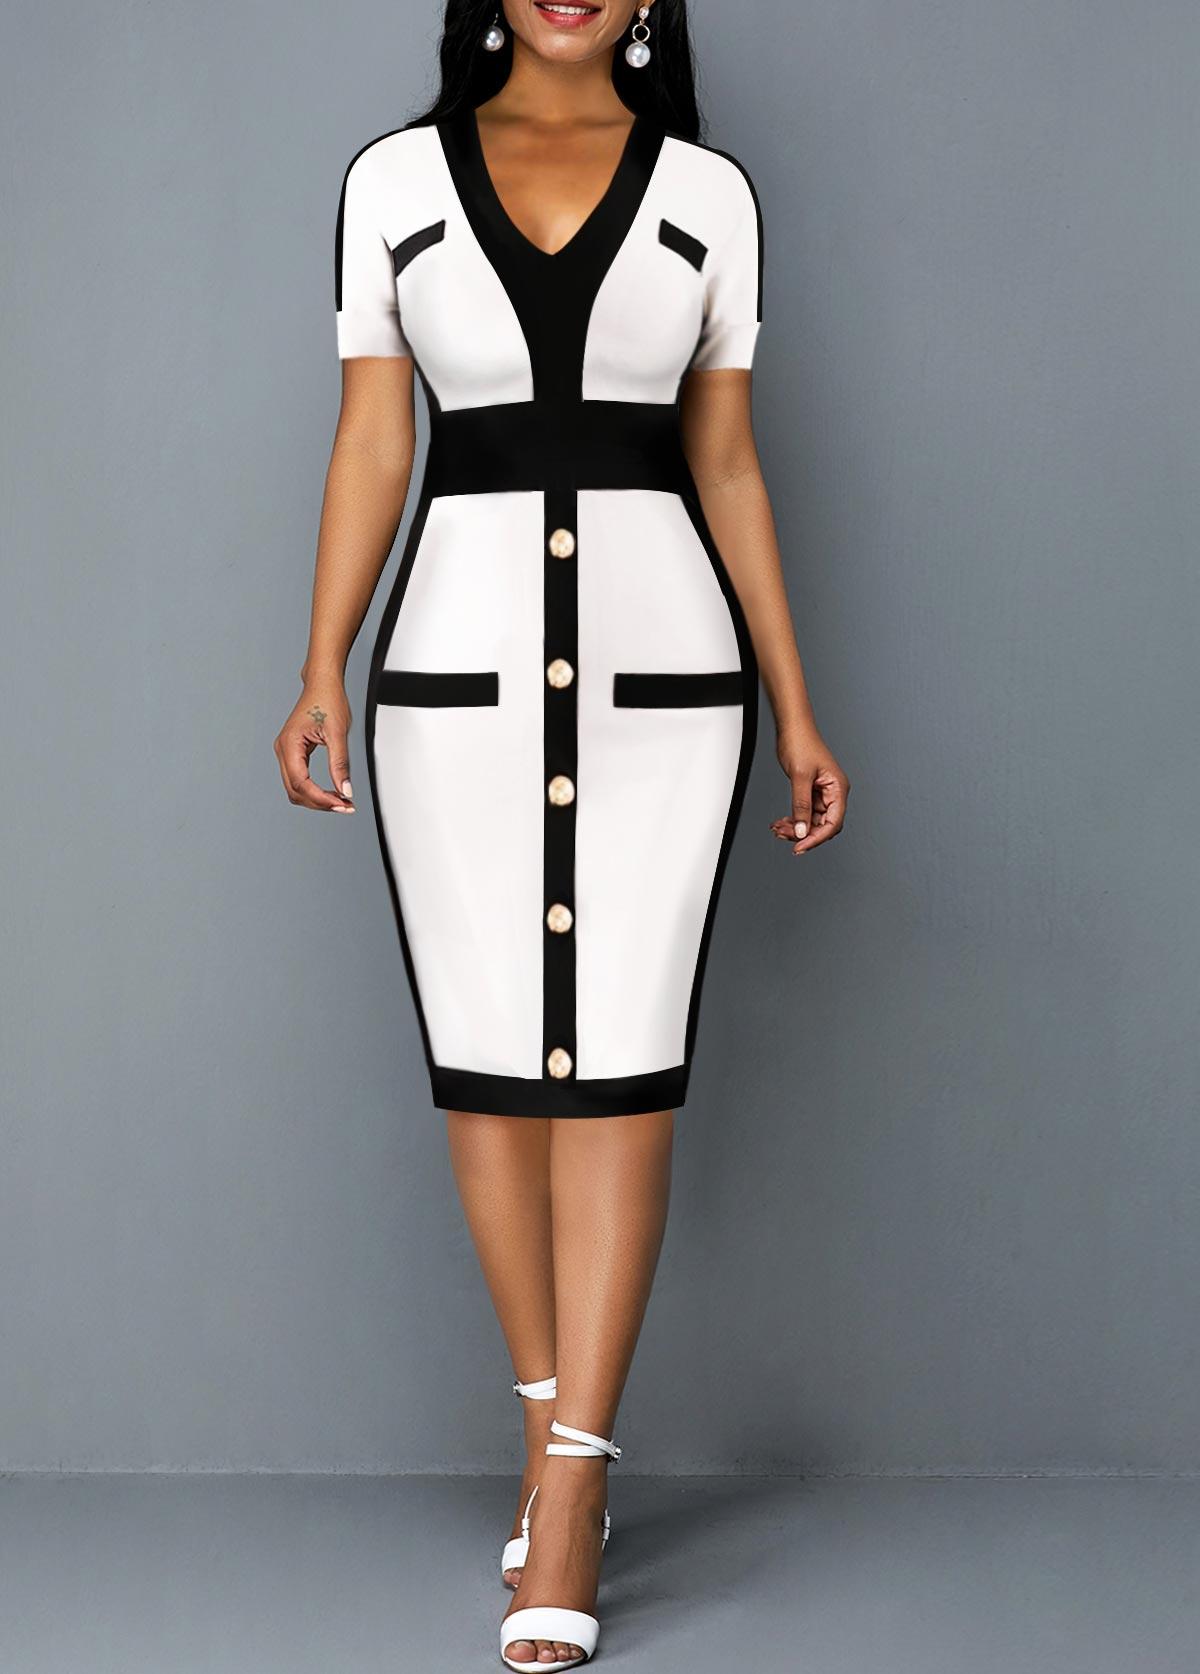 V Neck Short Sleeve Contrast Dress